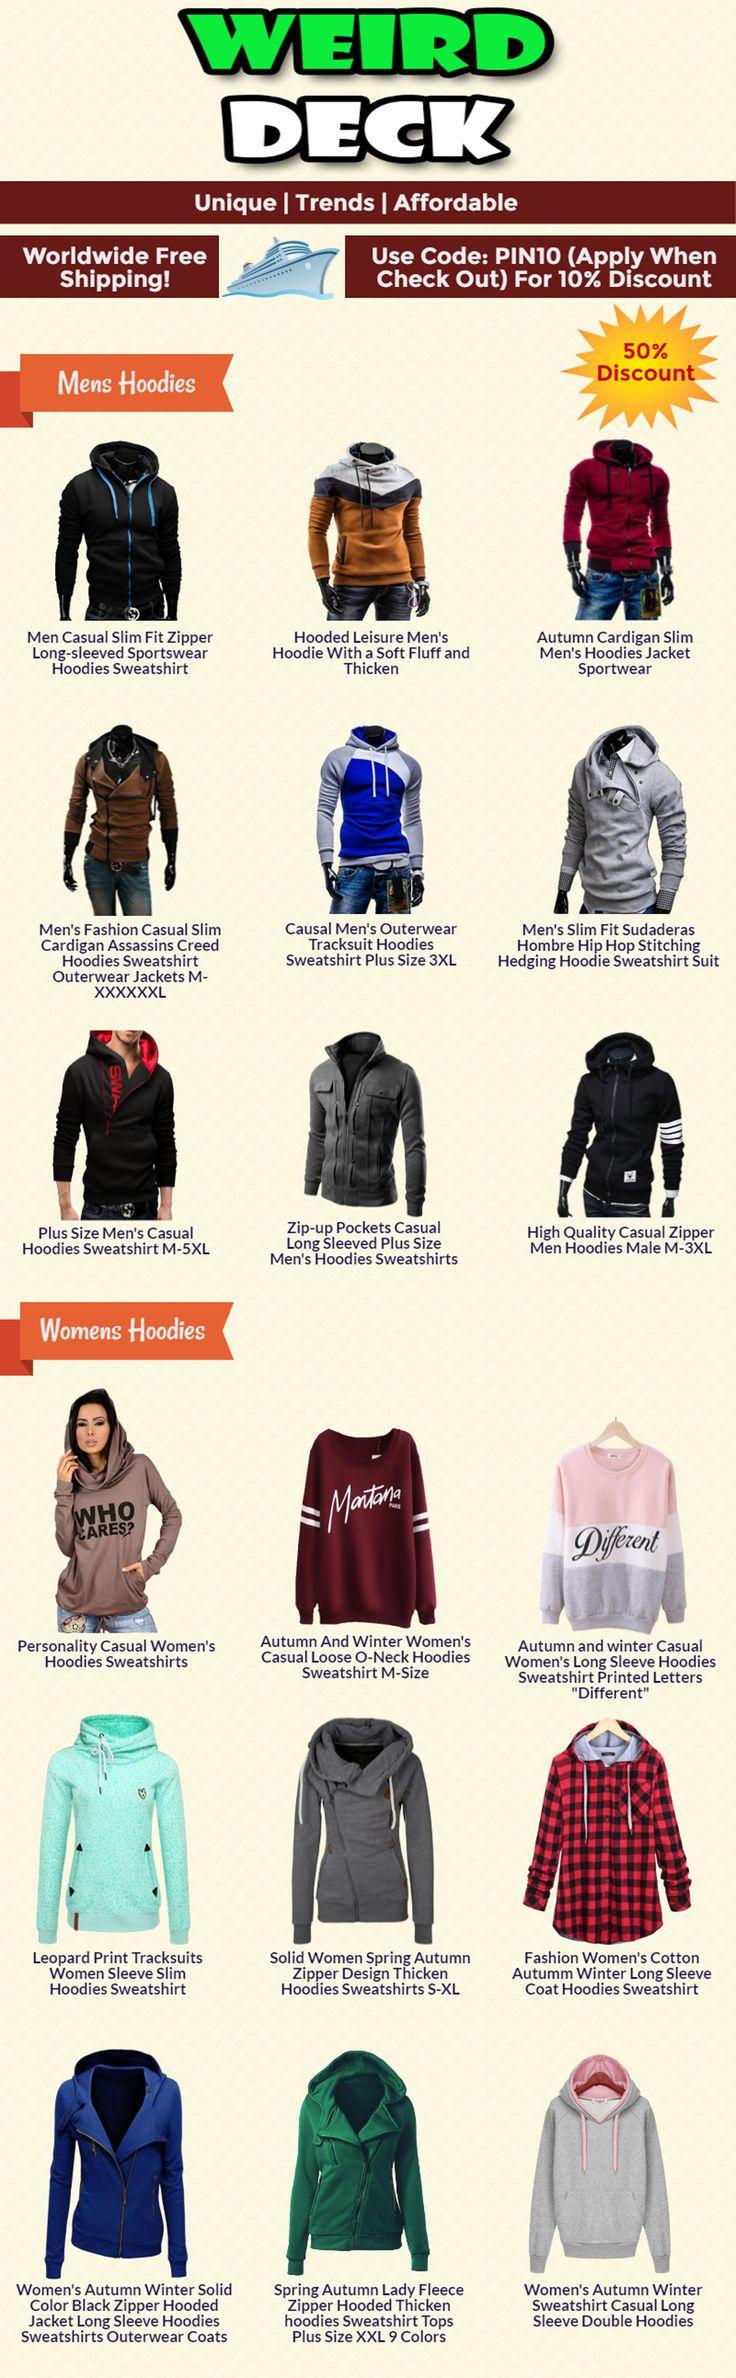 best menus clothes u accessories images on pinterest